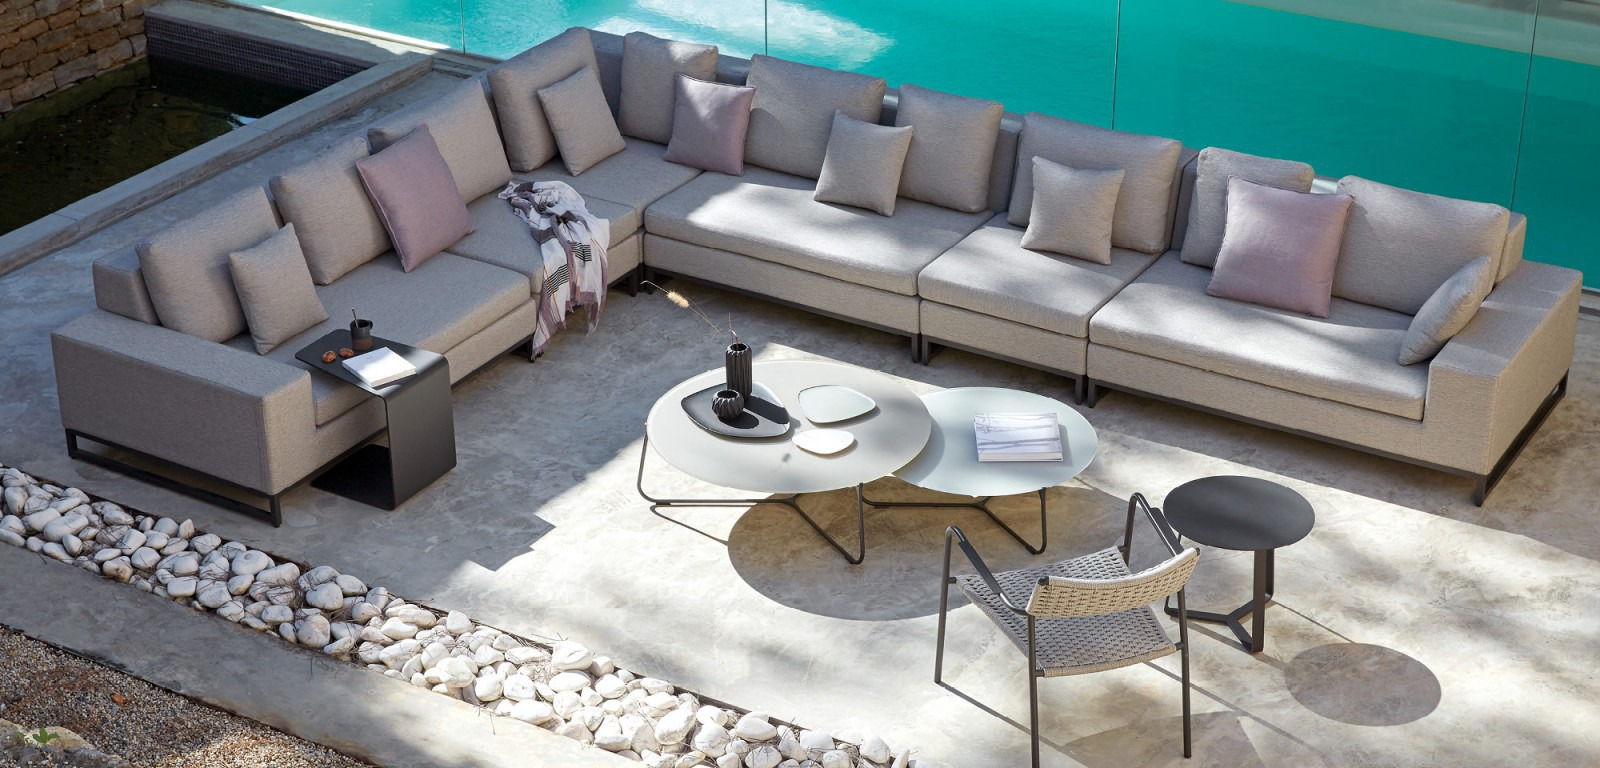 manutti delmi decor outdoor. Black Bedroom Furniture Sets. Home Design Ideas